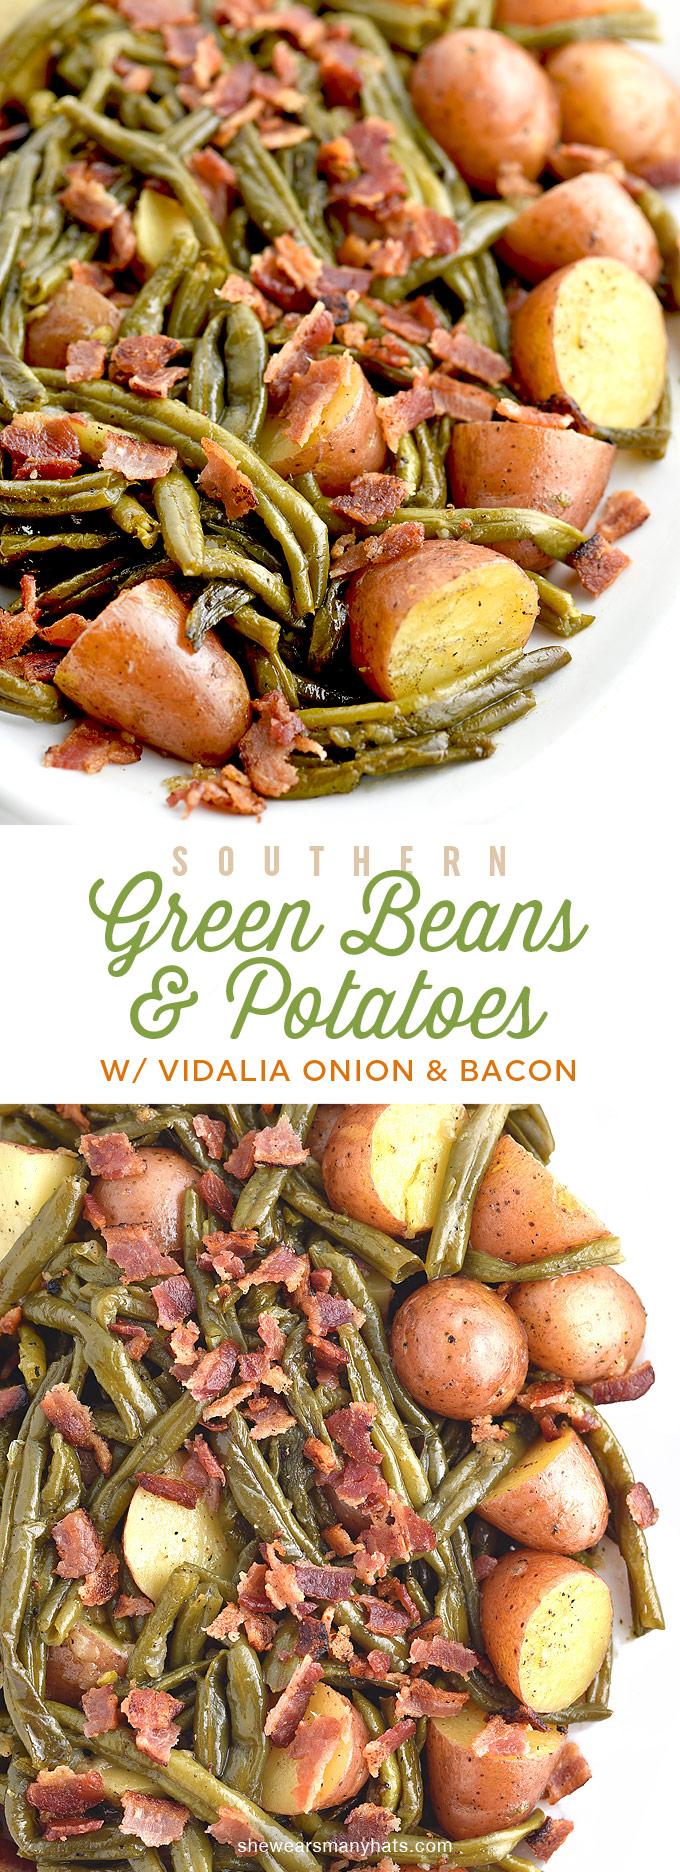 Southern Green Beans and Potatoes with Vidalia Onion and Bacon Recipe   shewearsmanyhats.com